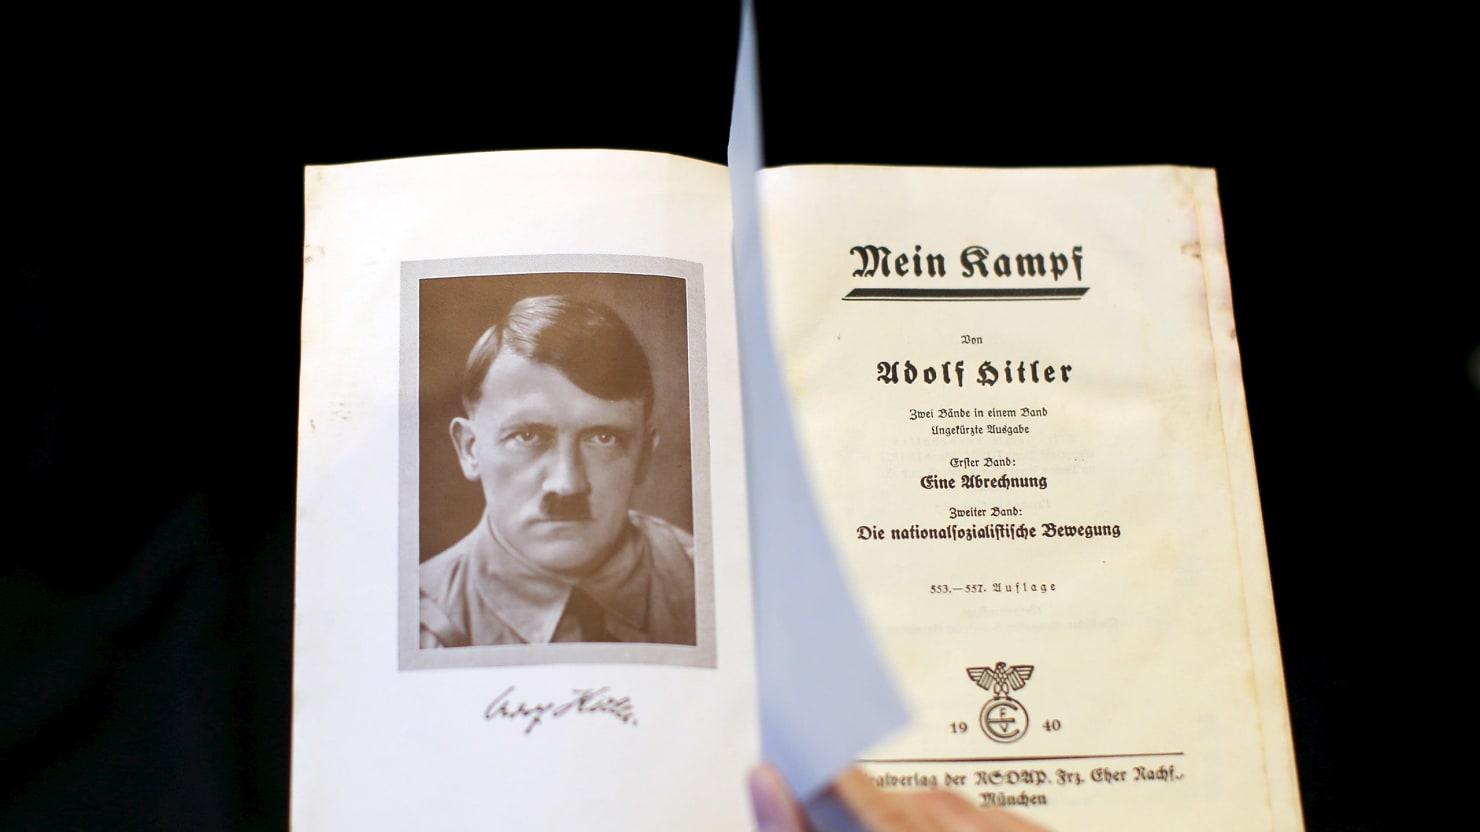 Mein Kampf Returns to Germany